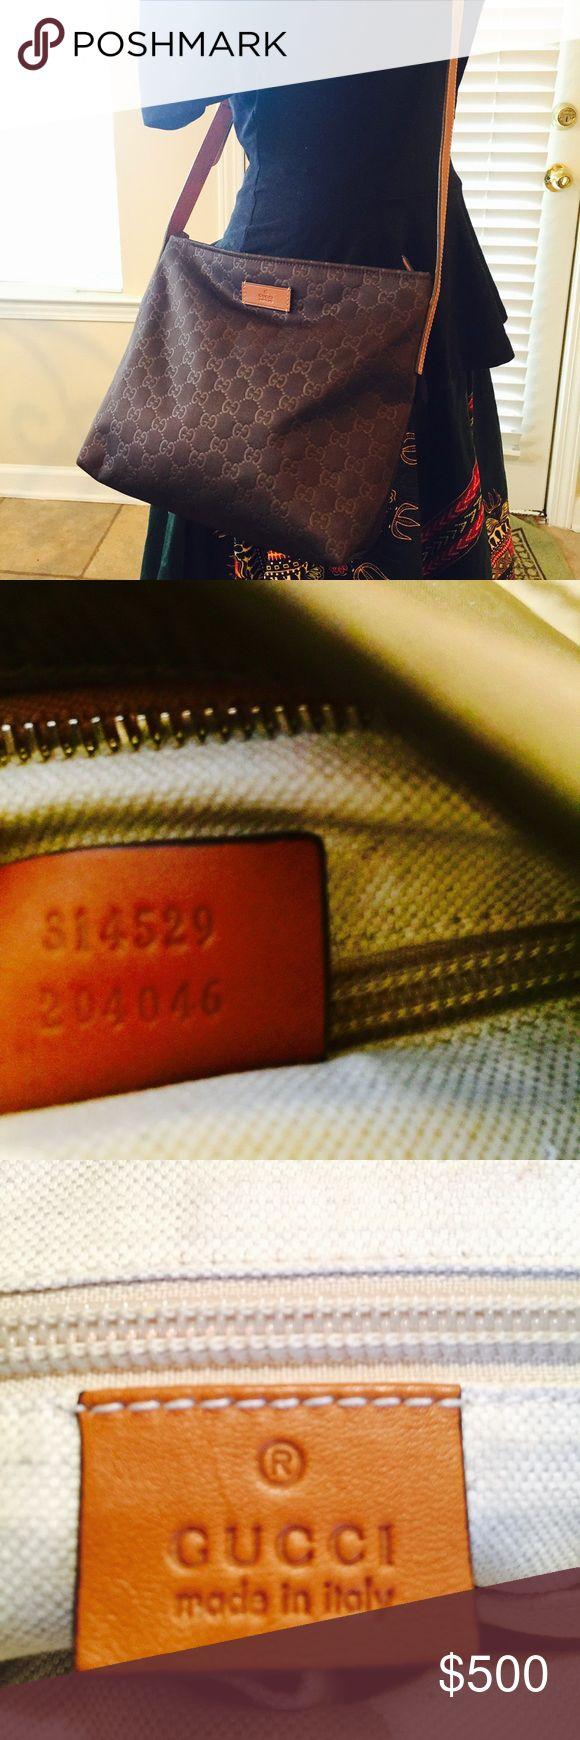 "🔥🔥AUTHENTIC Gucci Messenger Bag🔥🔥 100% Authentic Gucci Messenger Bag ""Excellent"" condition dark Brown Gucci Bags Shoulder Bags"